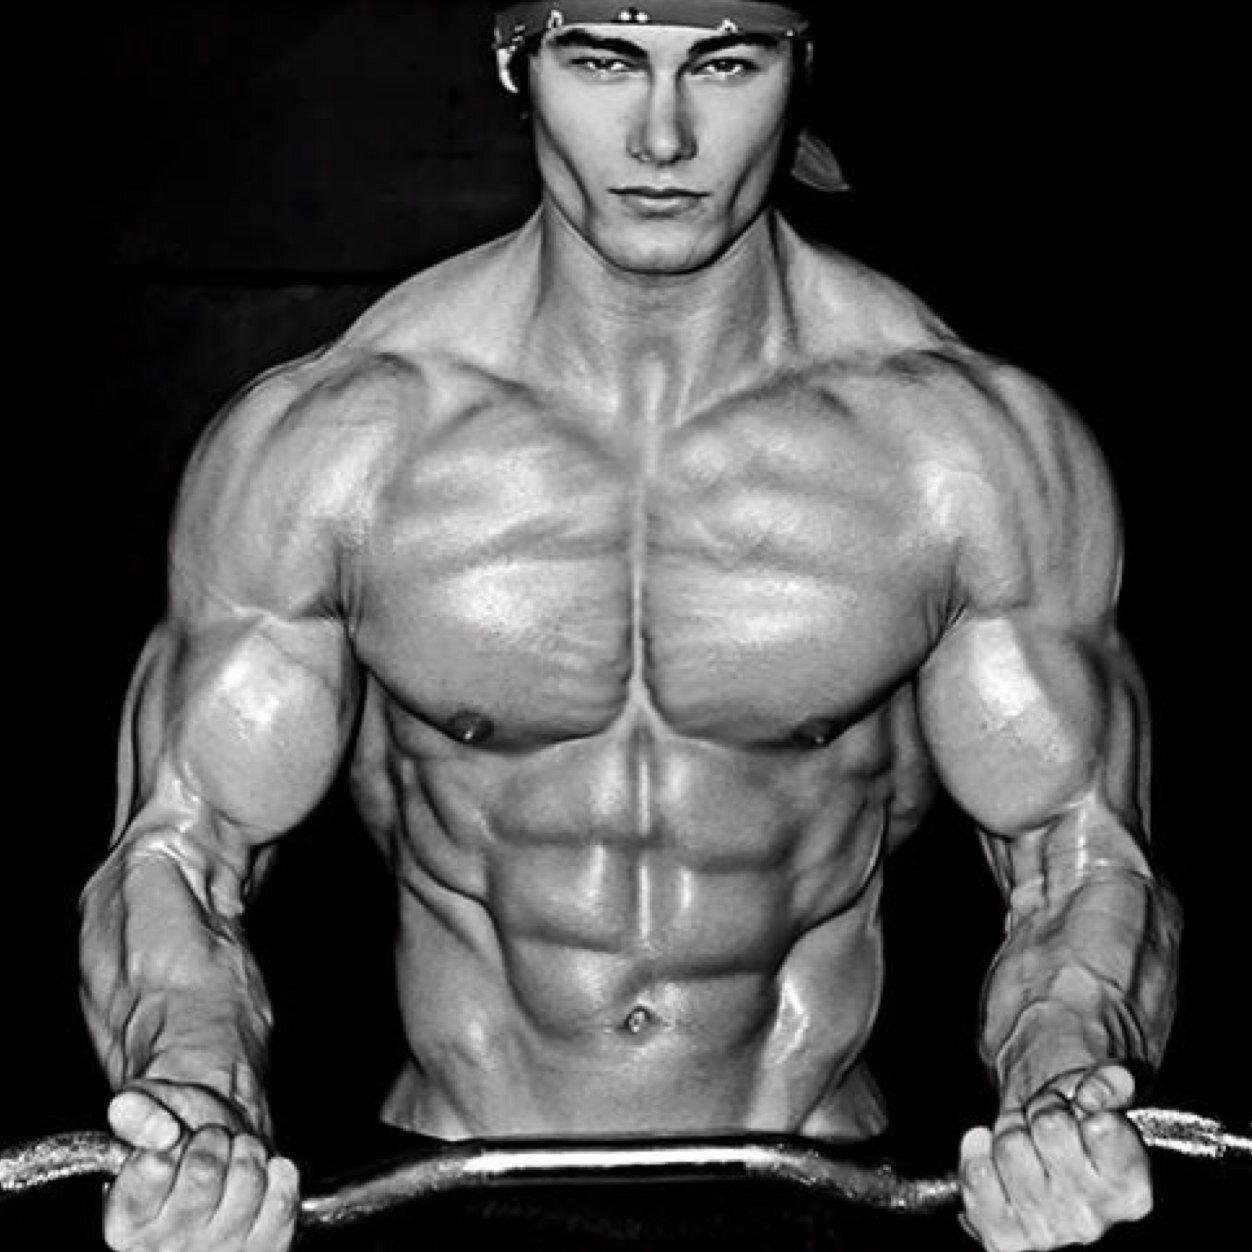 Jeff Seid Men Pinterest Fitness Bodybuilding And Workout